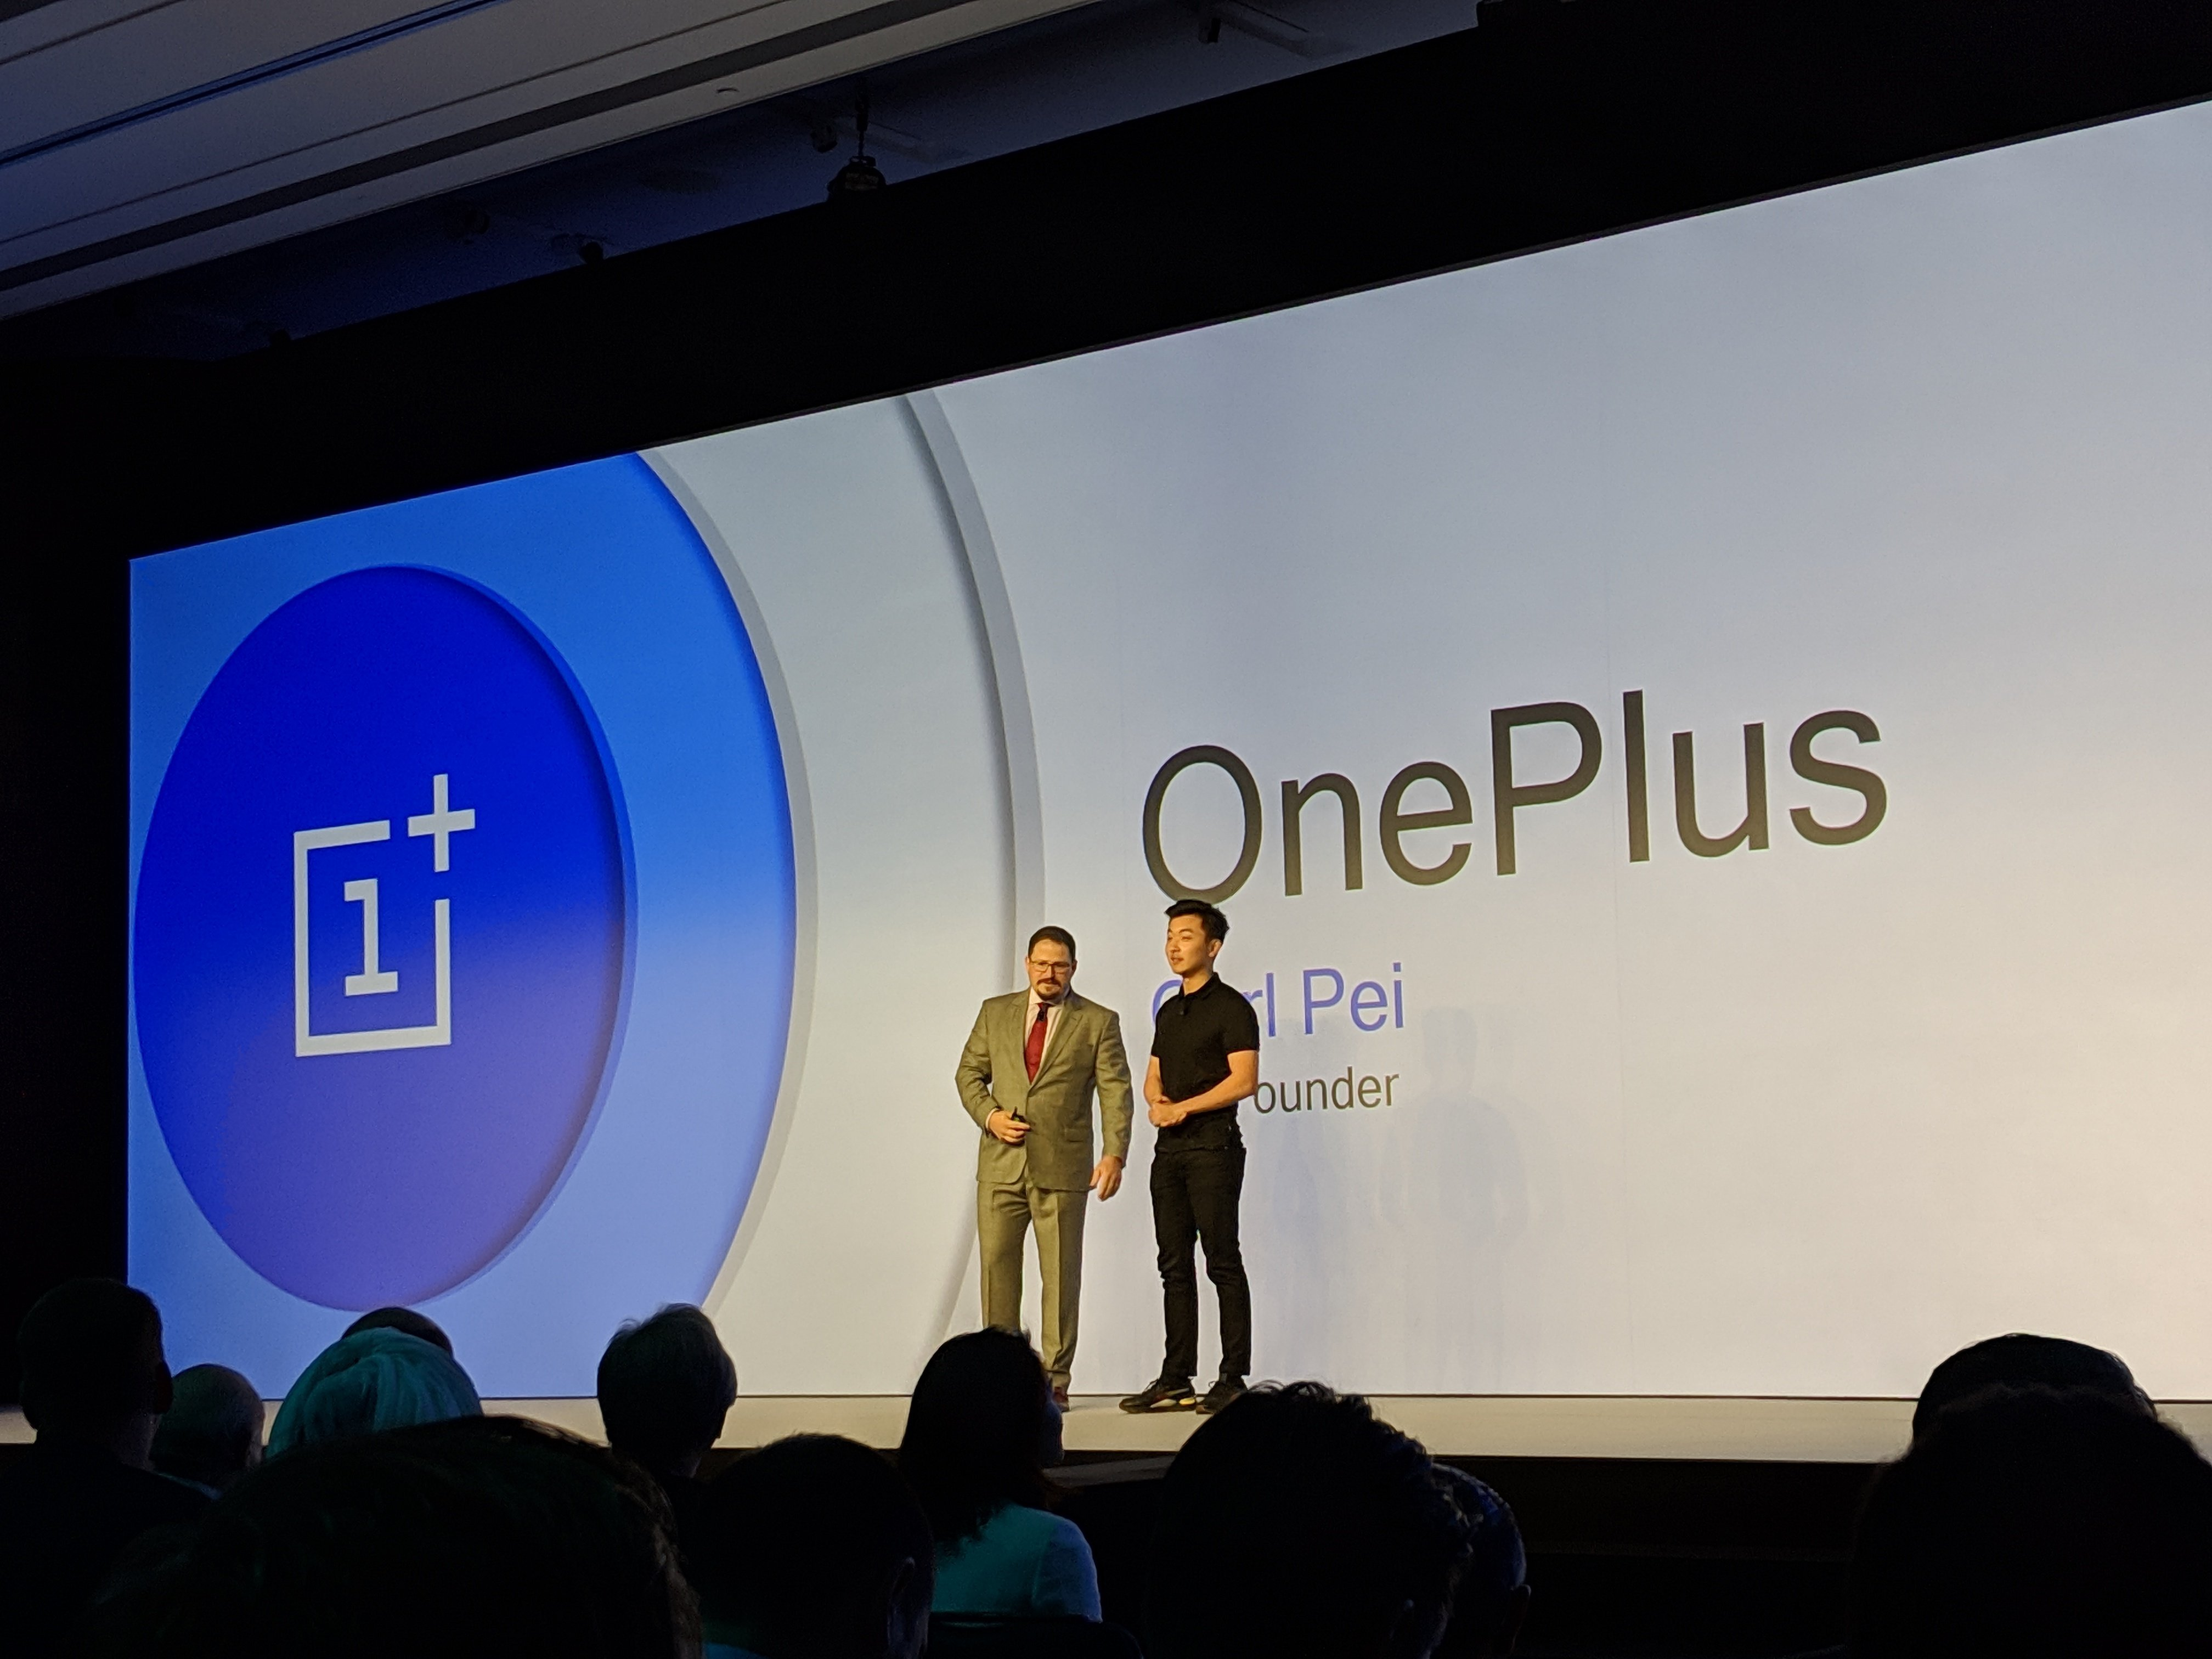 Sony, Samsung, OnePlus, Xiaomi et LG lanceront un smartphone 5G en 2019